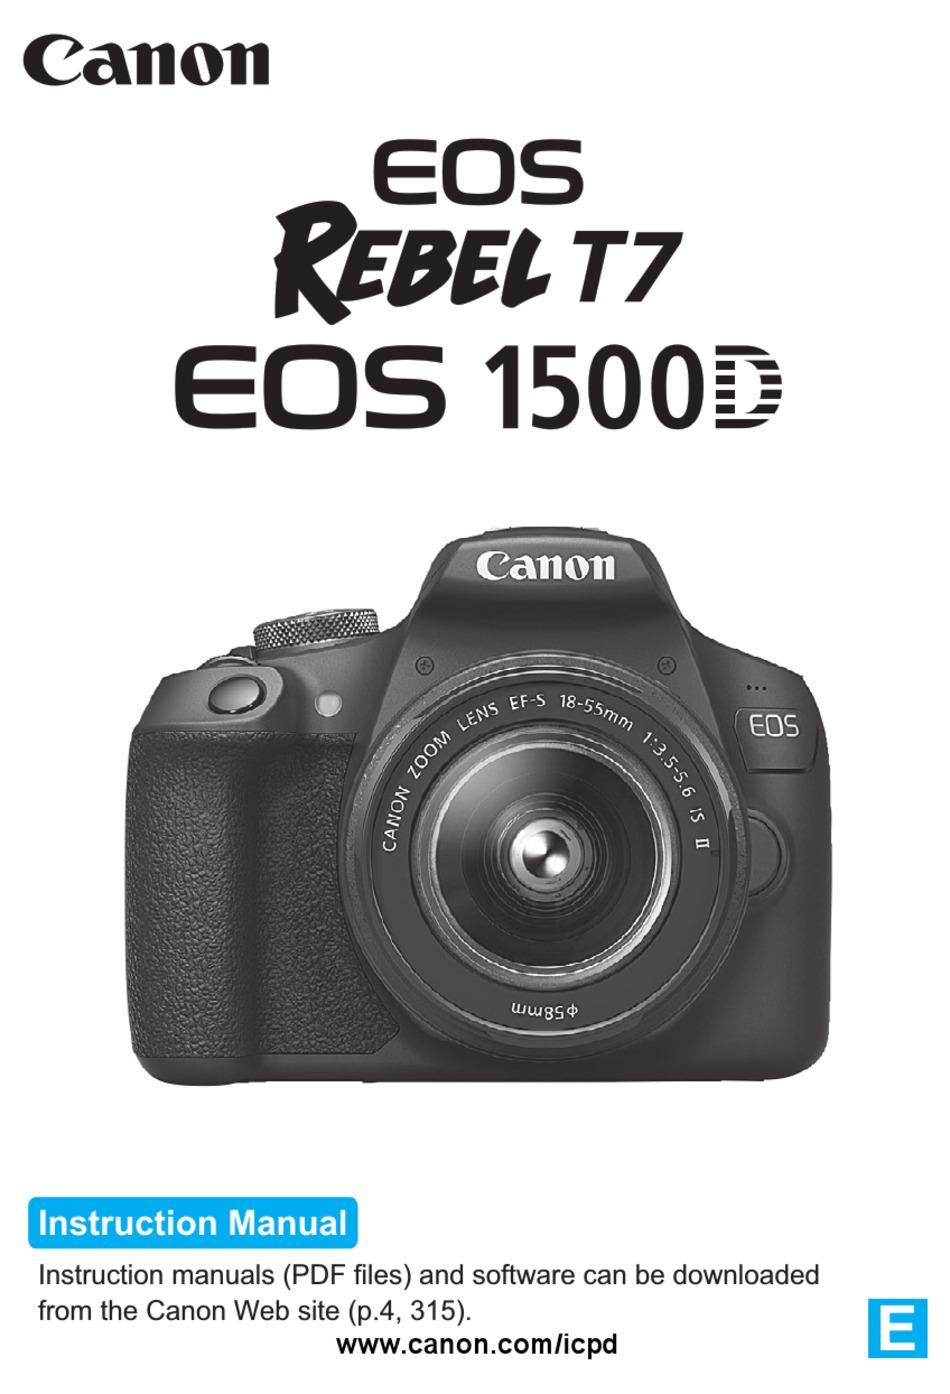 CANON EOS 20D REBEL T20 INSTRUCTION MANUAL Pdf Download   ManualsLib